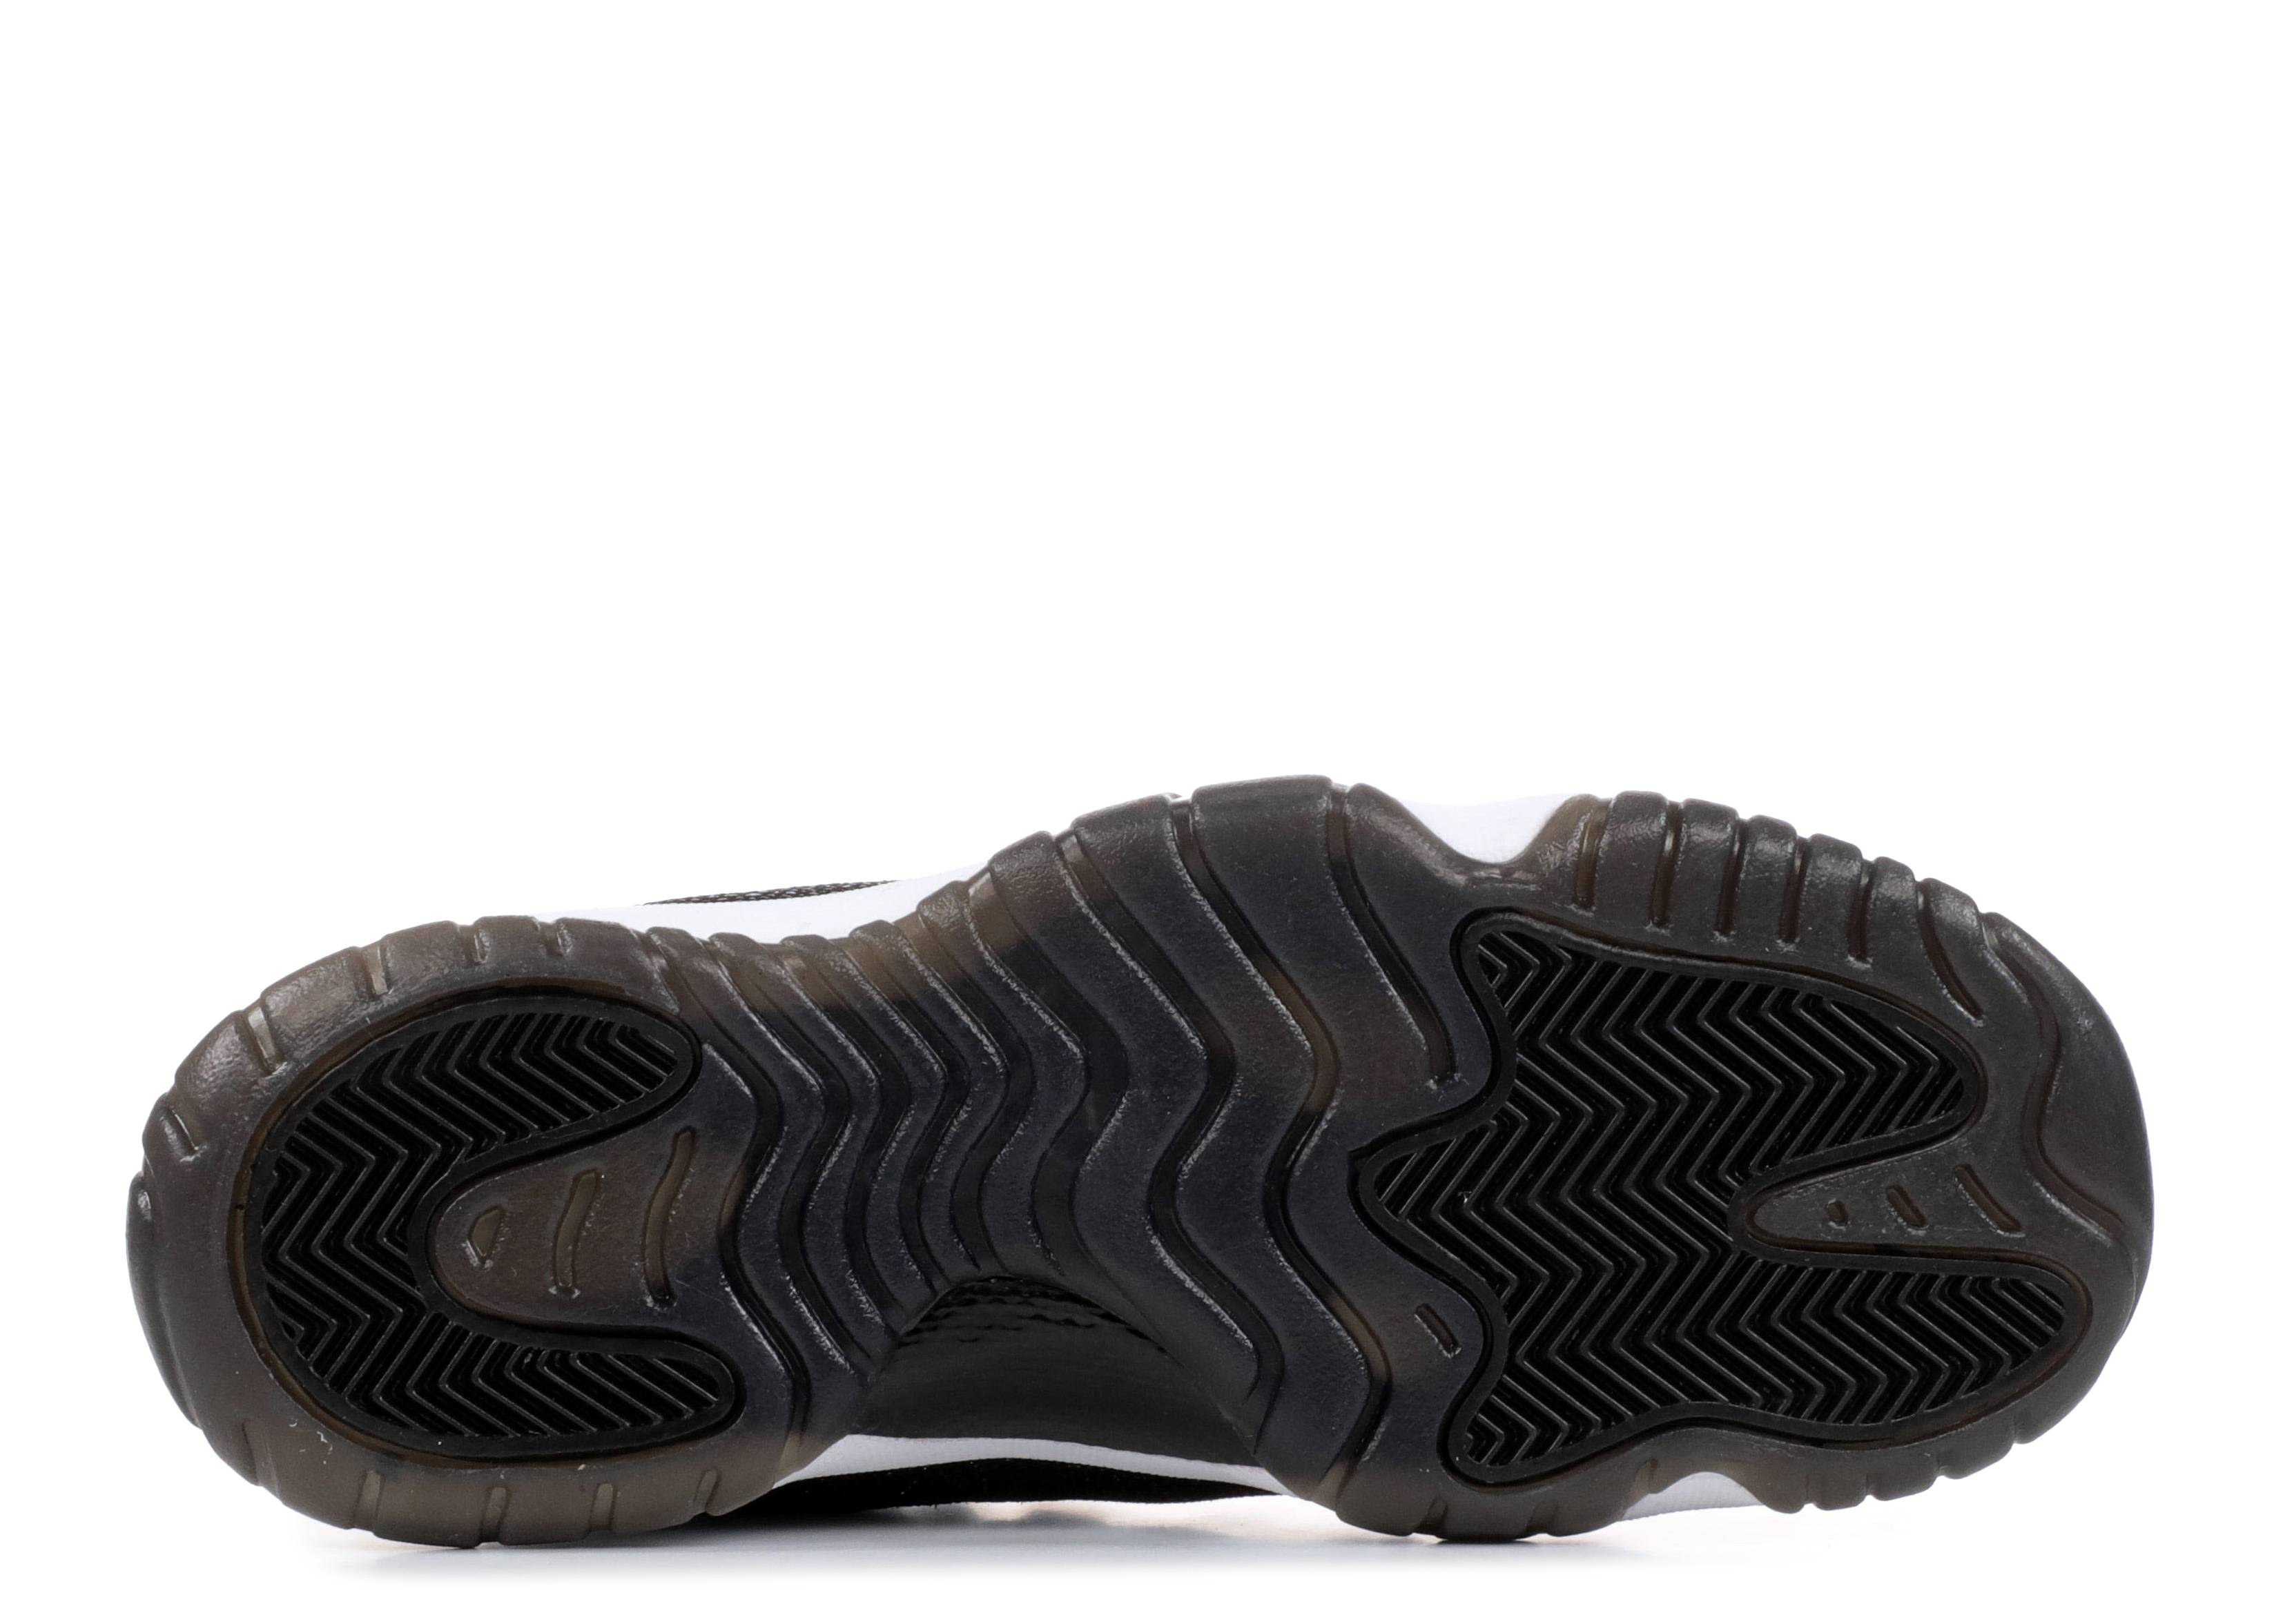 Air Jordan 11 Retro Prem Hc (gs)